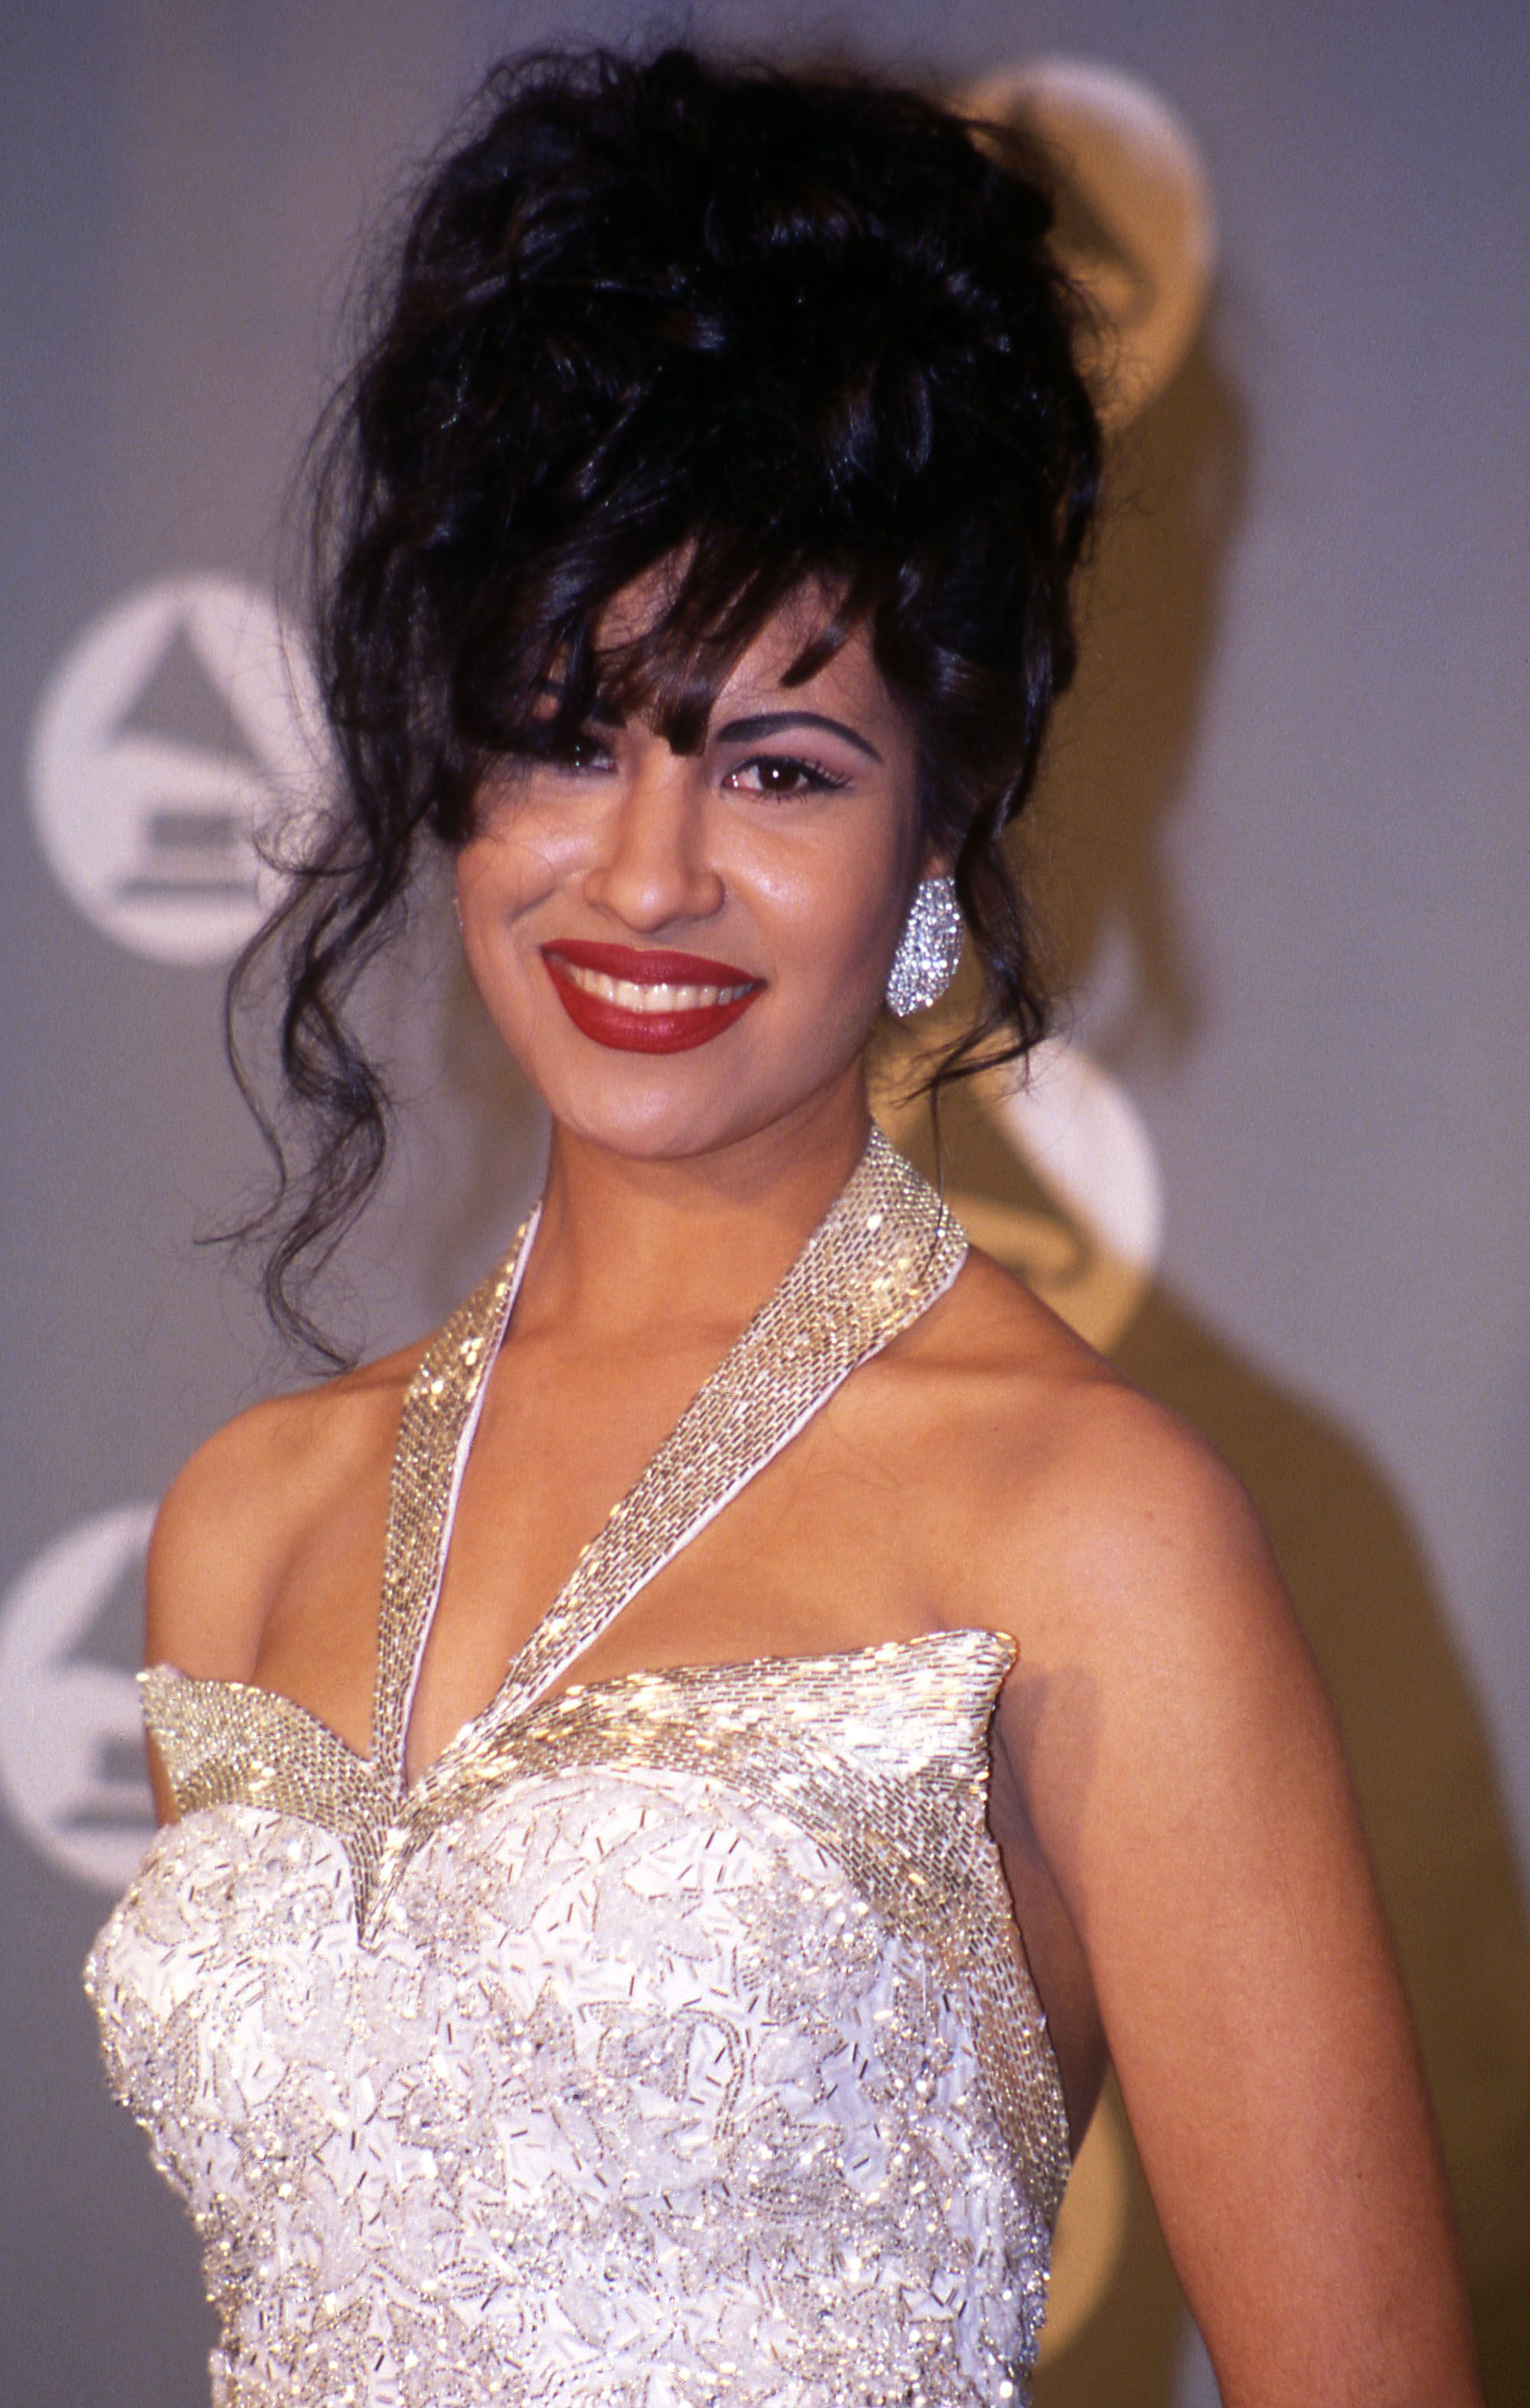 Selena in the press room at the 1994 Grammy Awards in New York City, New York